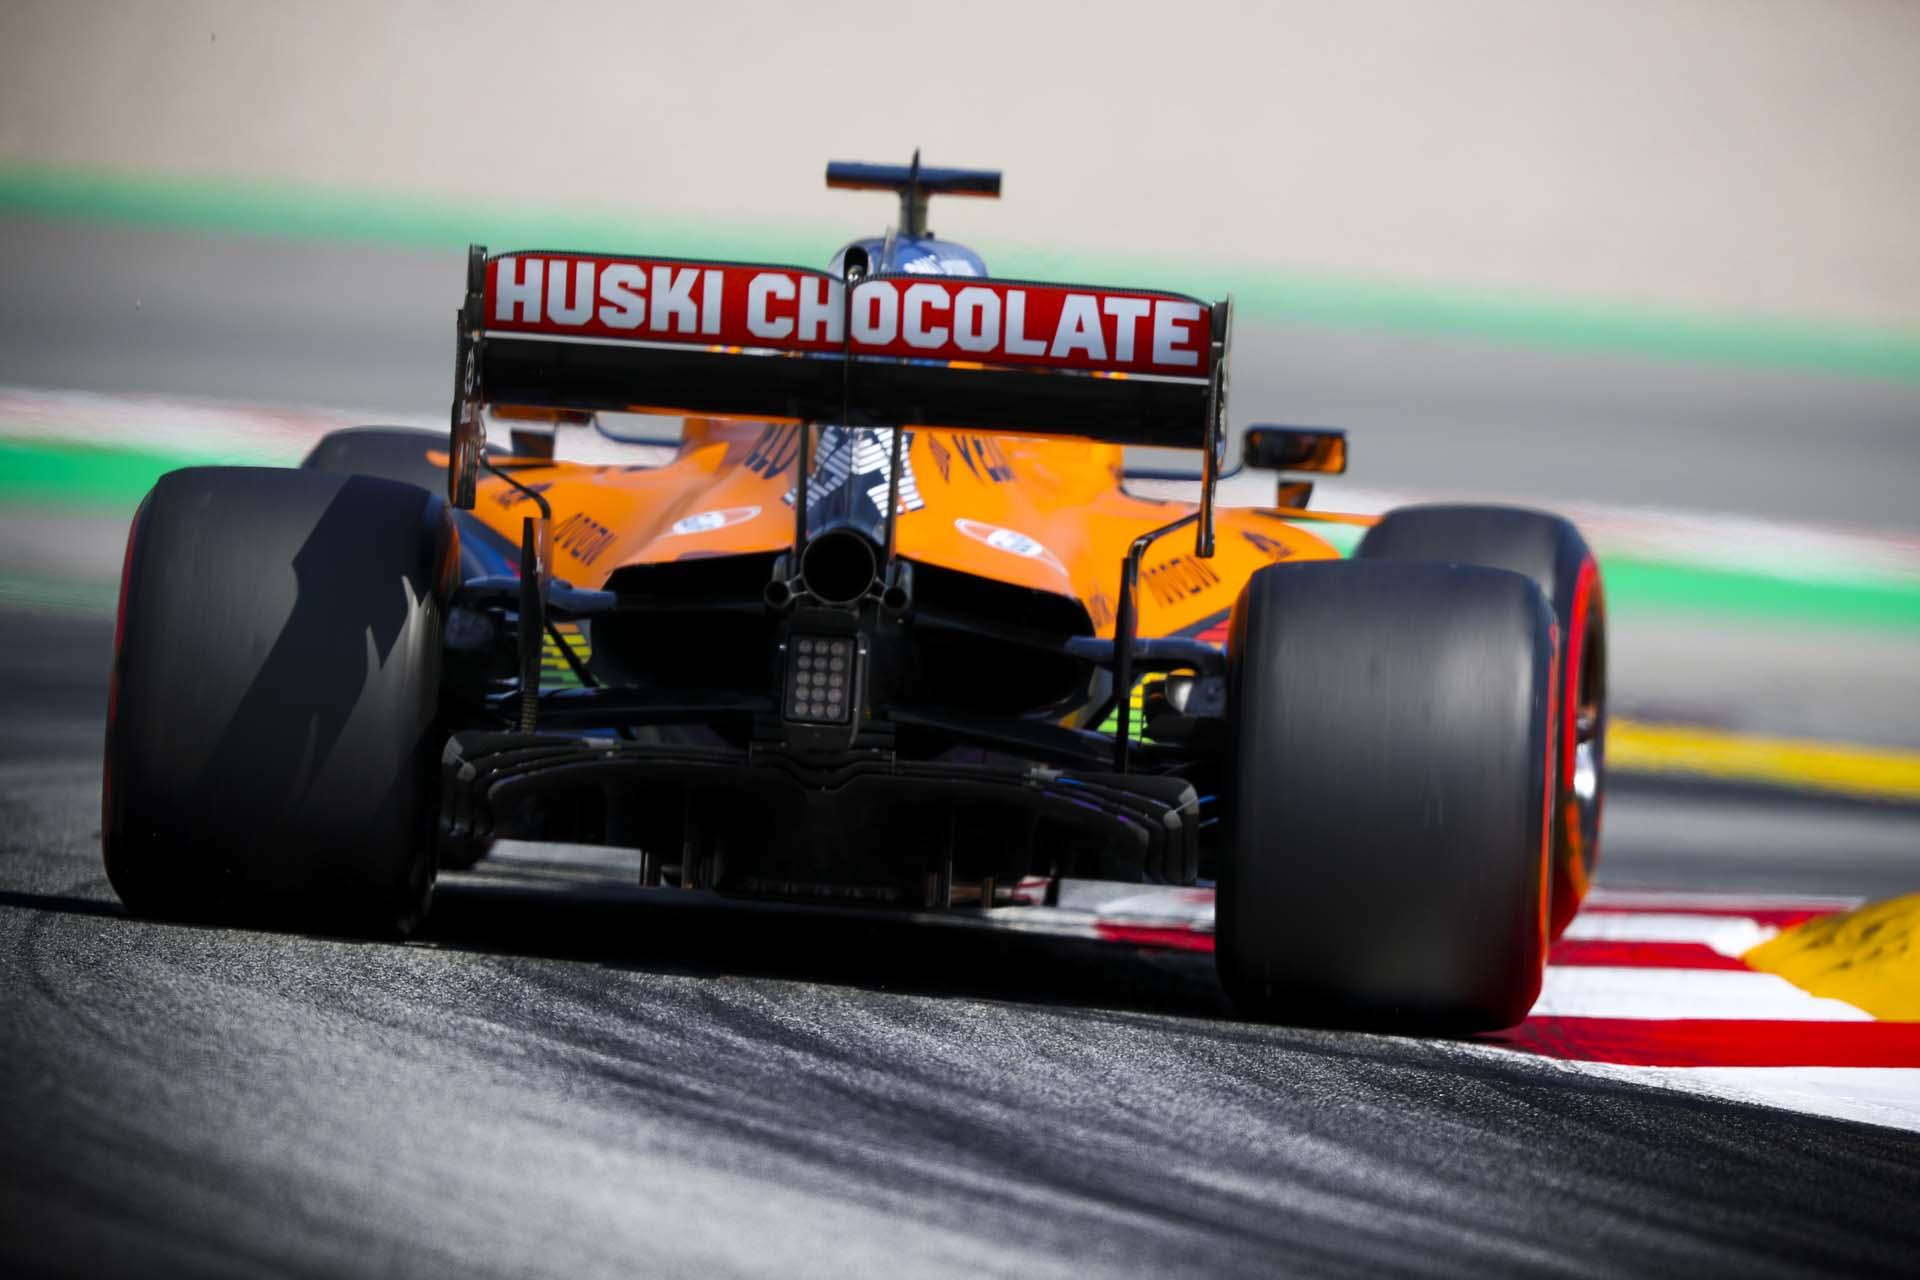 Carlos Sainz, McLaren MCL35, rides a kerb entering a chicane